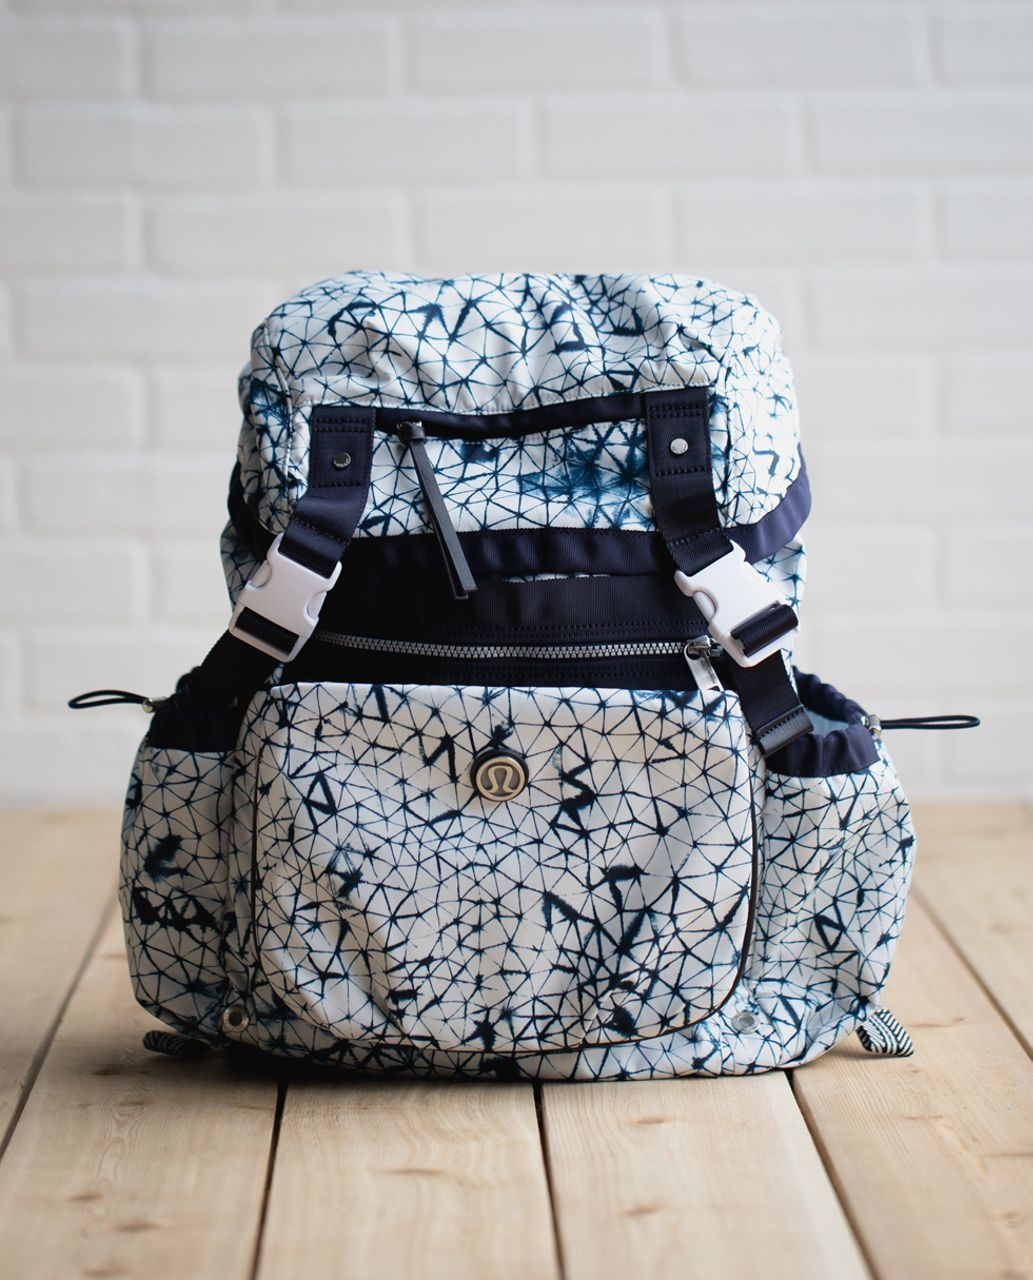 Lululemon Travelling Yogini Rucksack *Polyester - Star Crushed White Deep Navy / Naval Blue